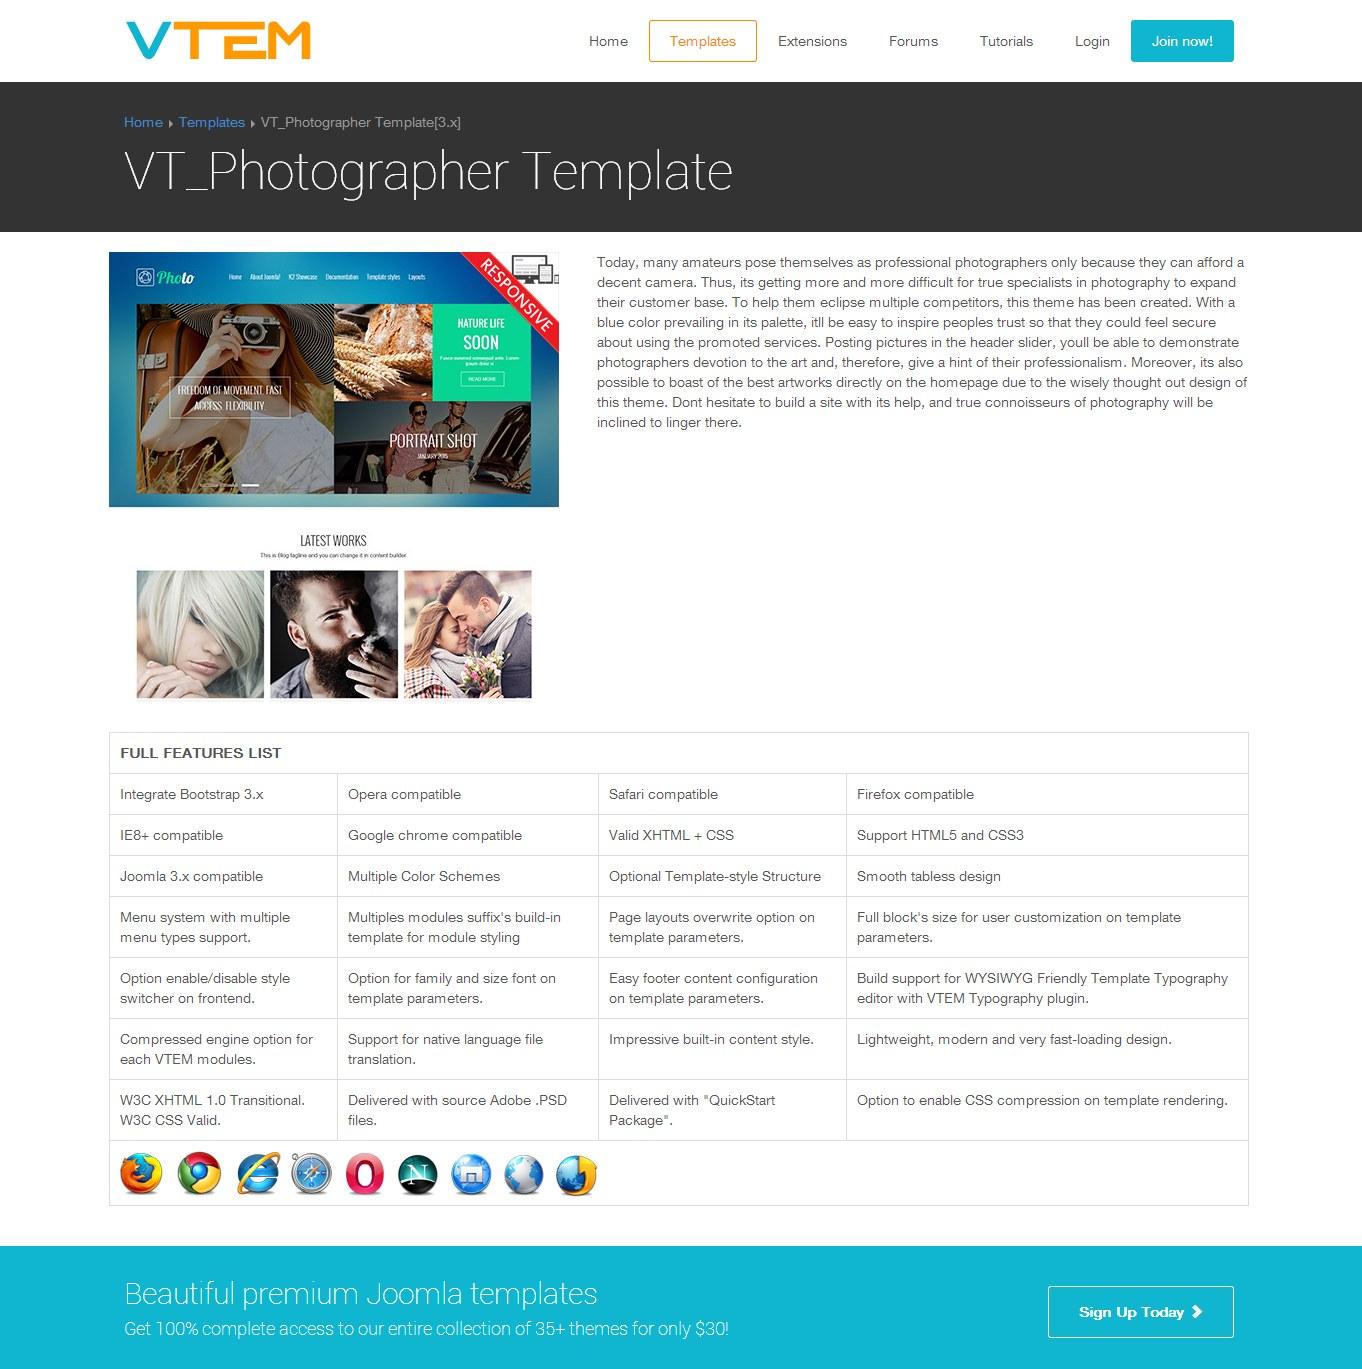 VT Dating - joomla template